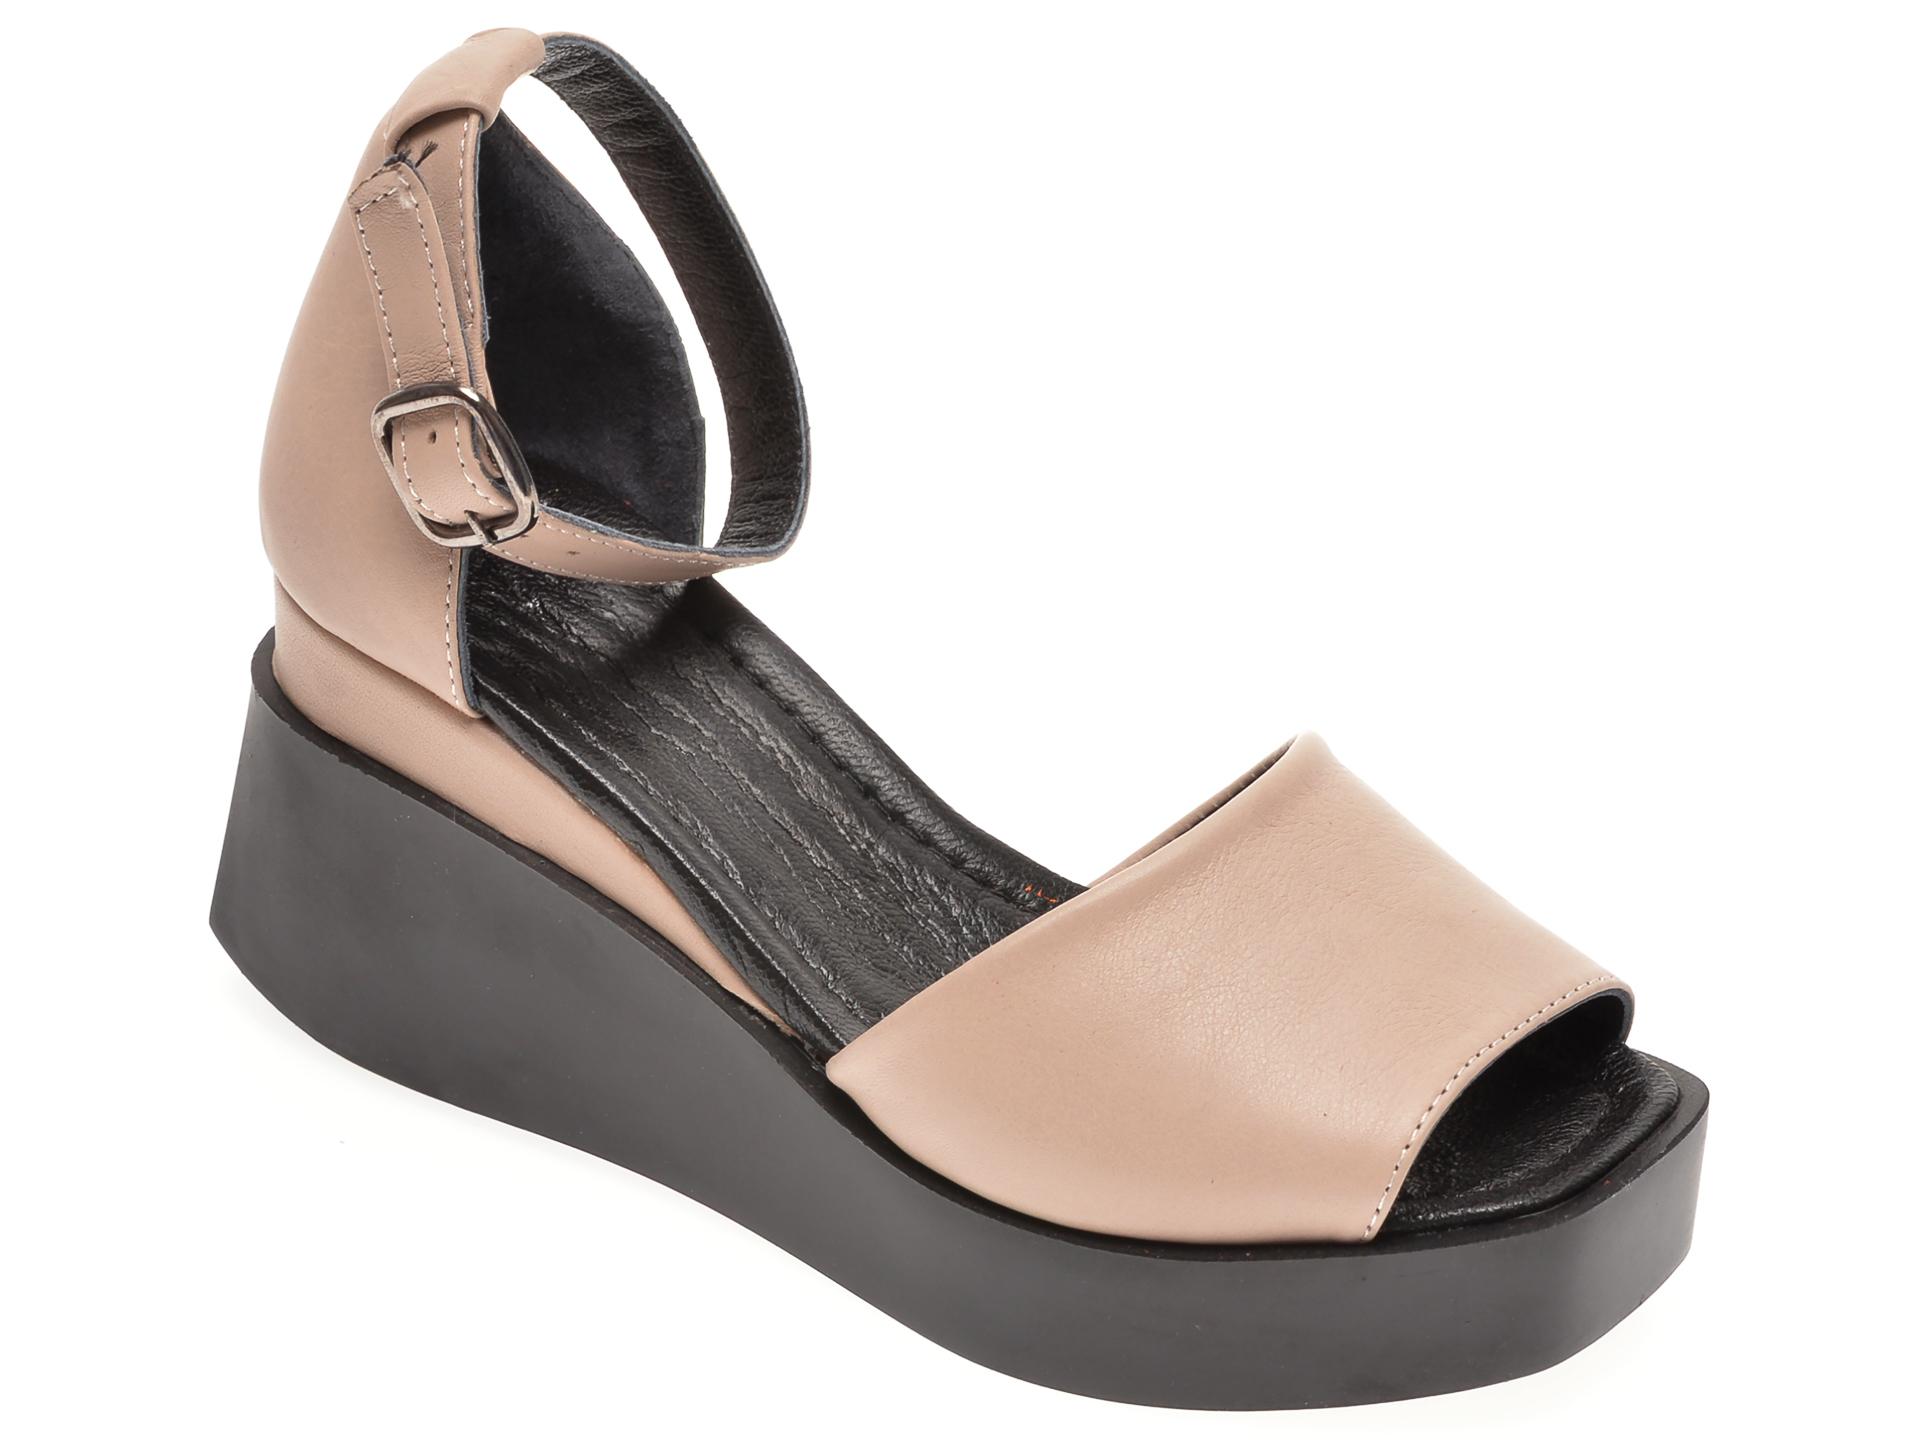 Sandale FLAVIA PASSINI maro, 022624, din piele naturala